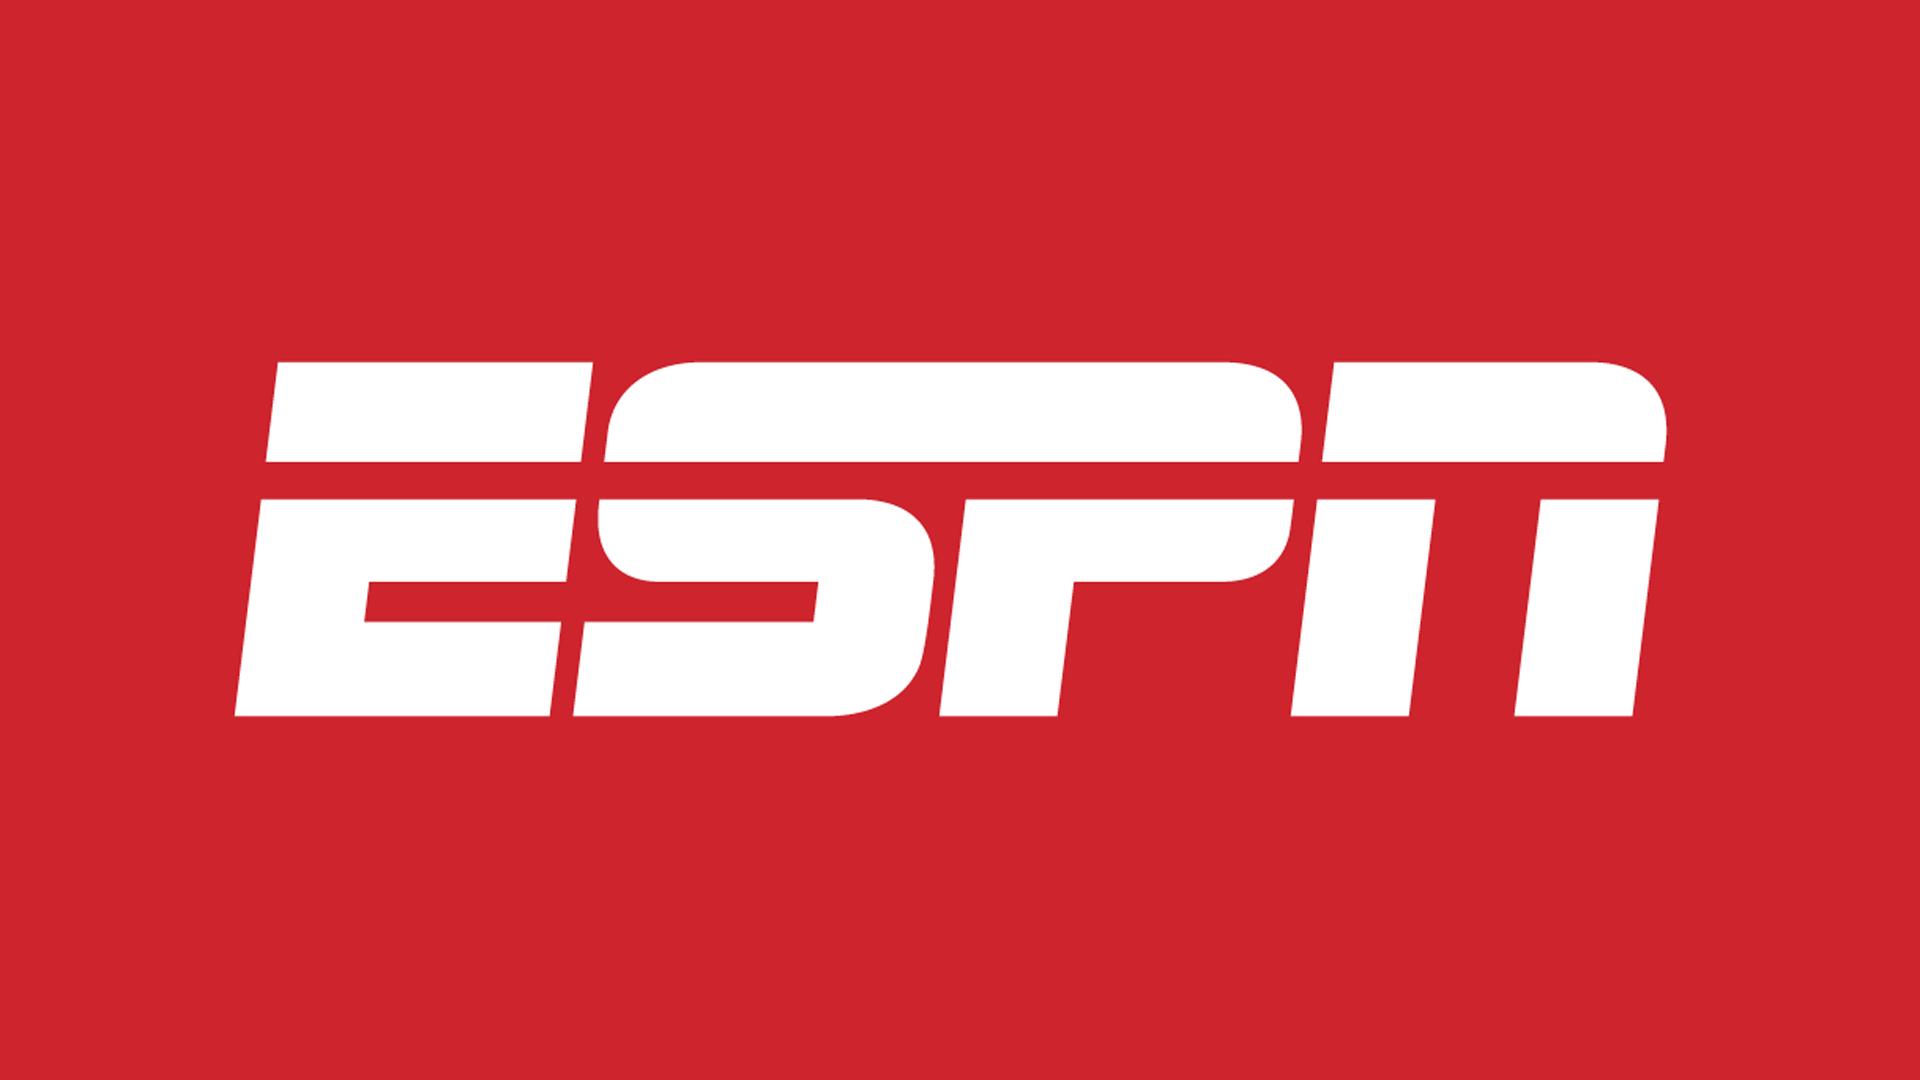 Espn Pulls Announcer Named Robert Lee From University Of Virginia Football Game